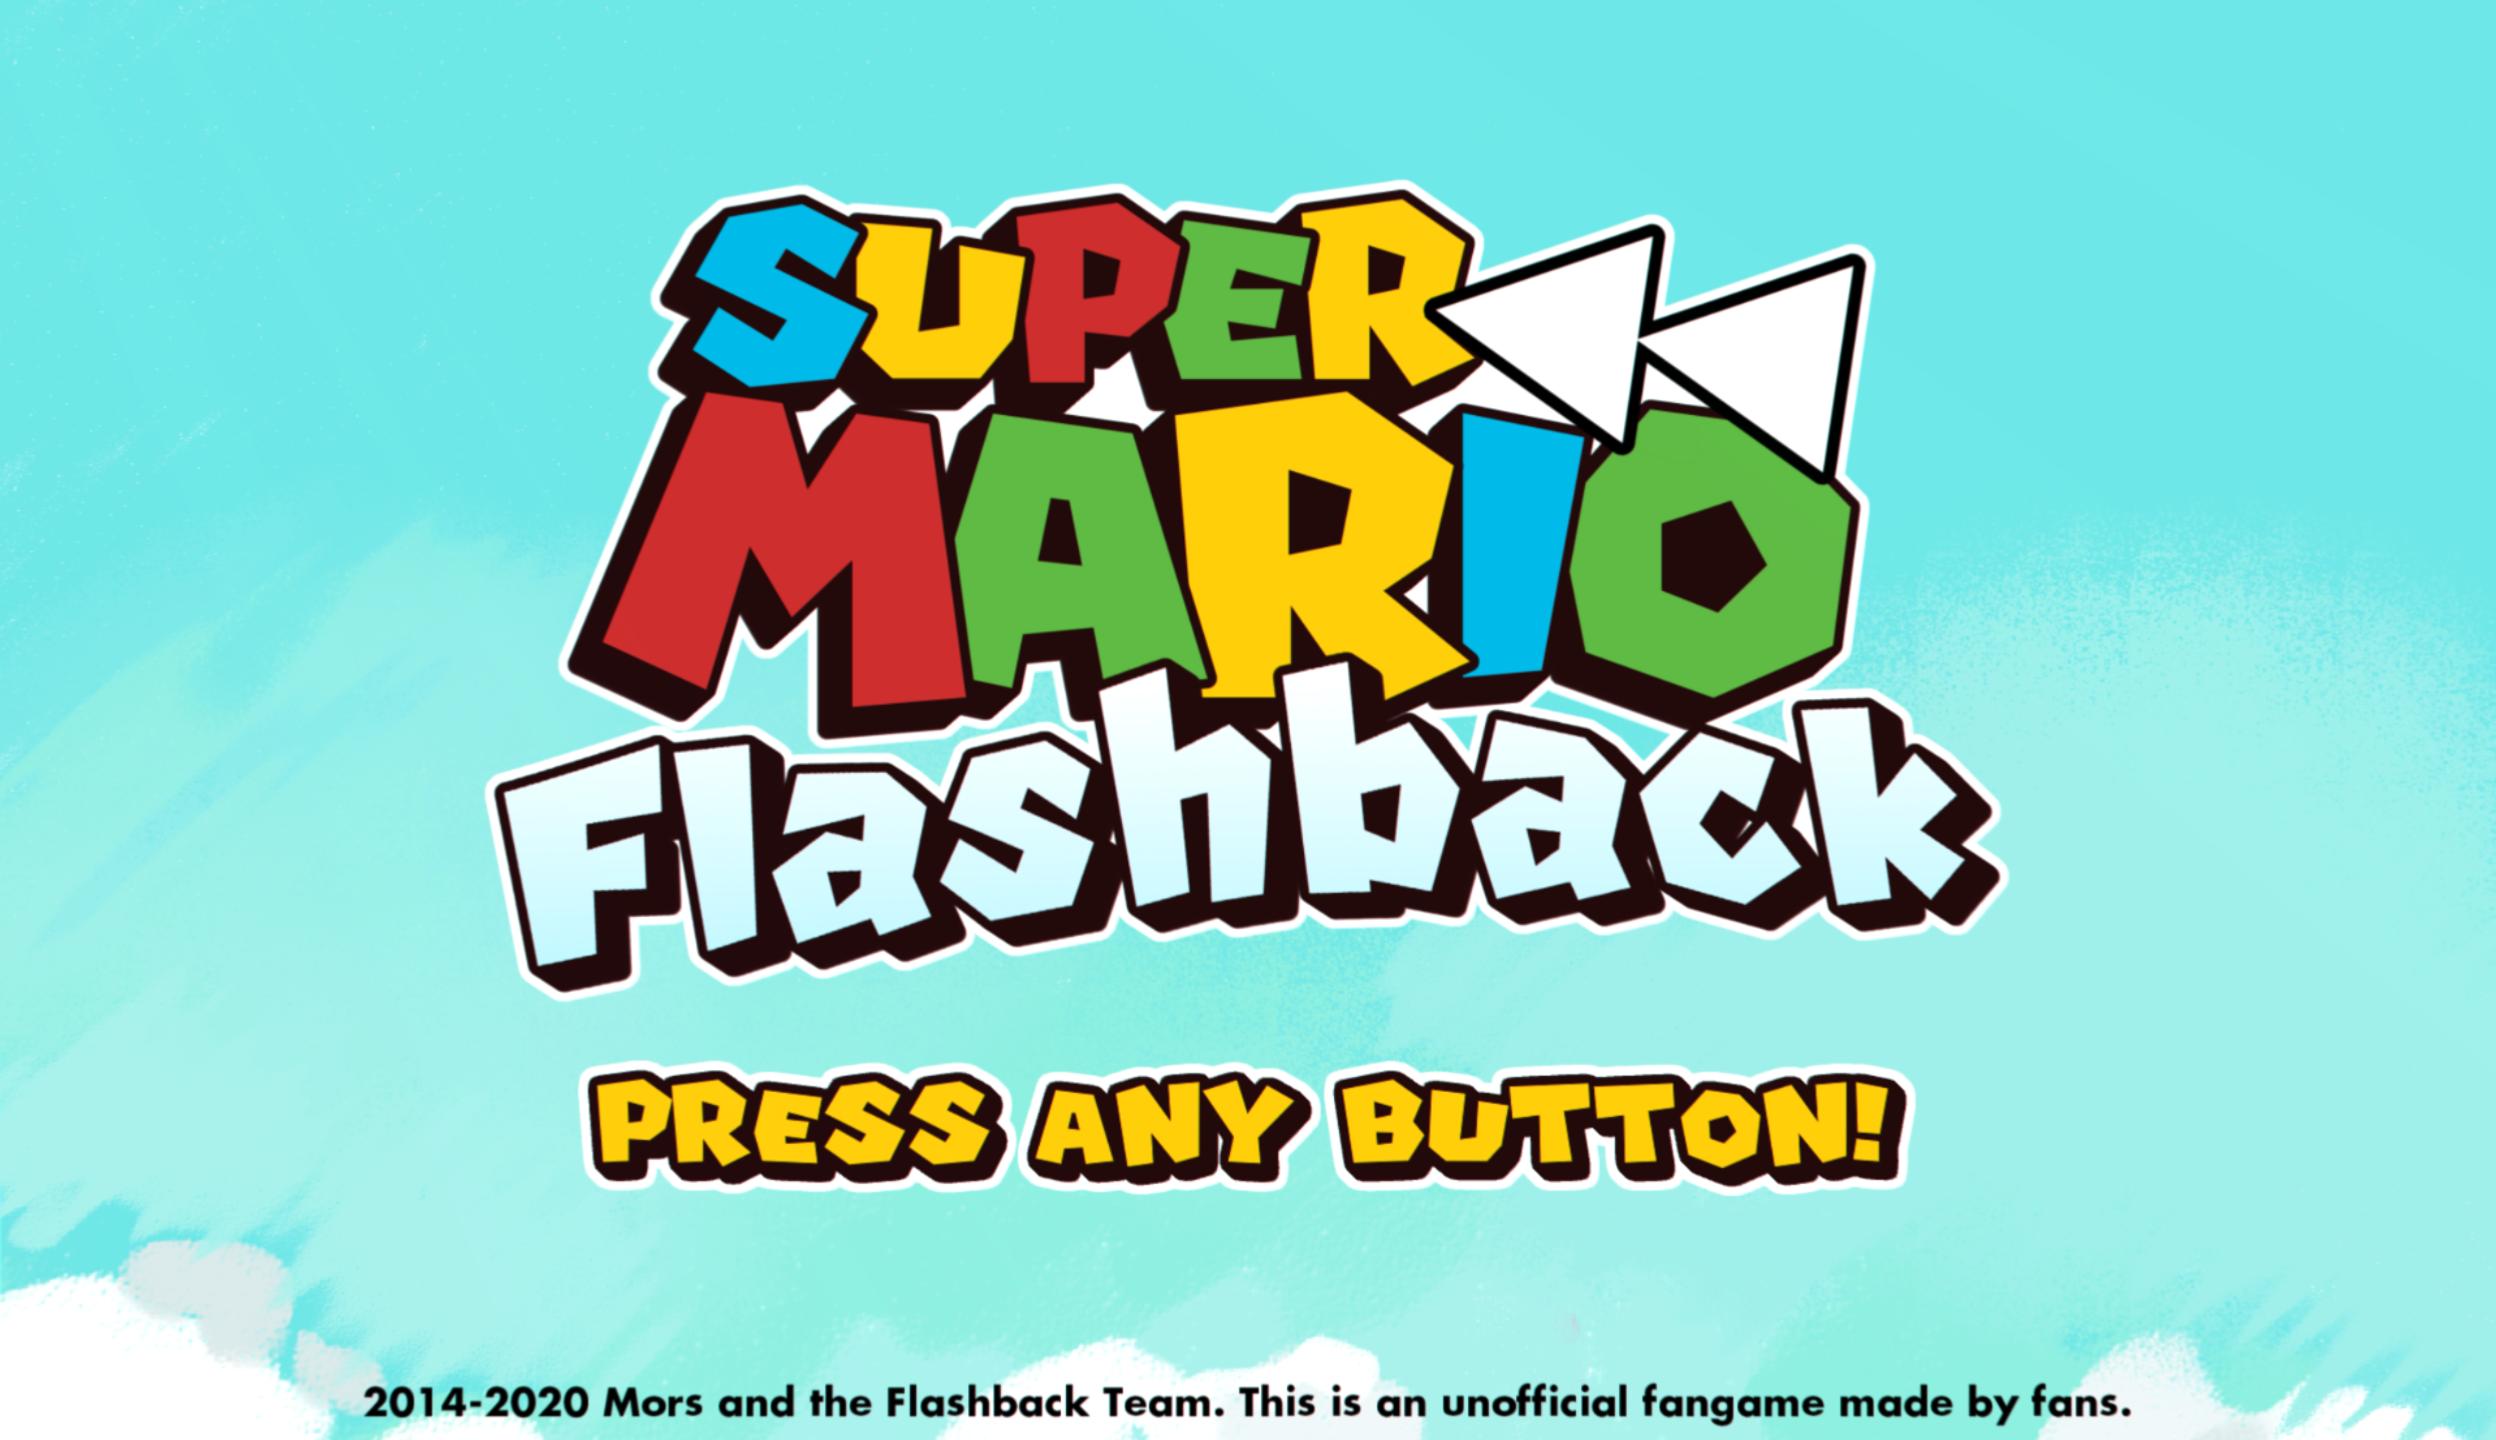 super-mario-flashback.png